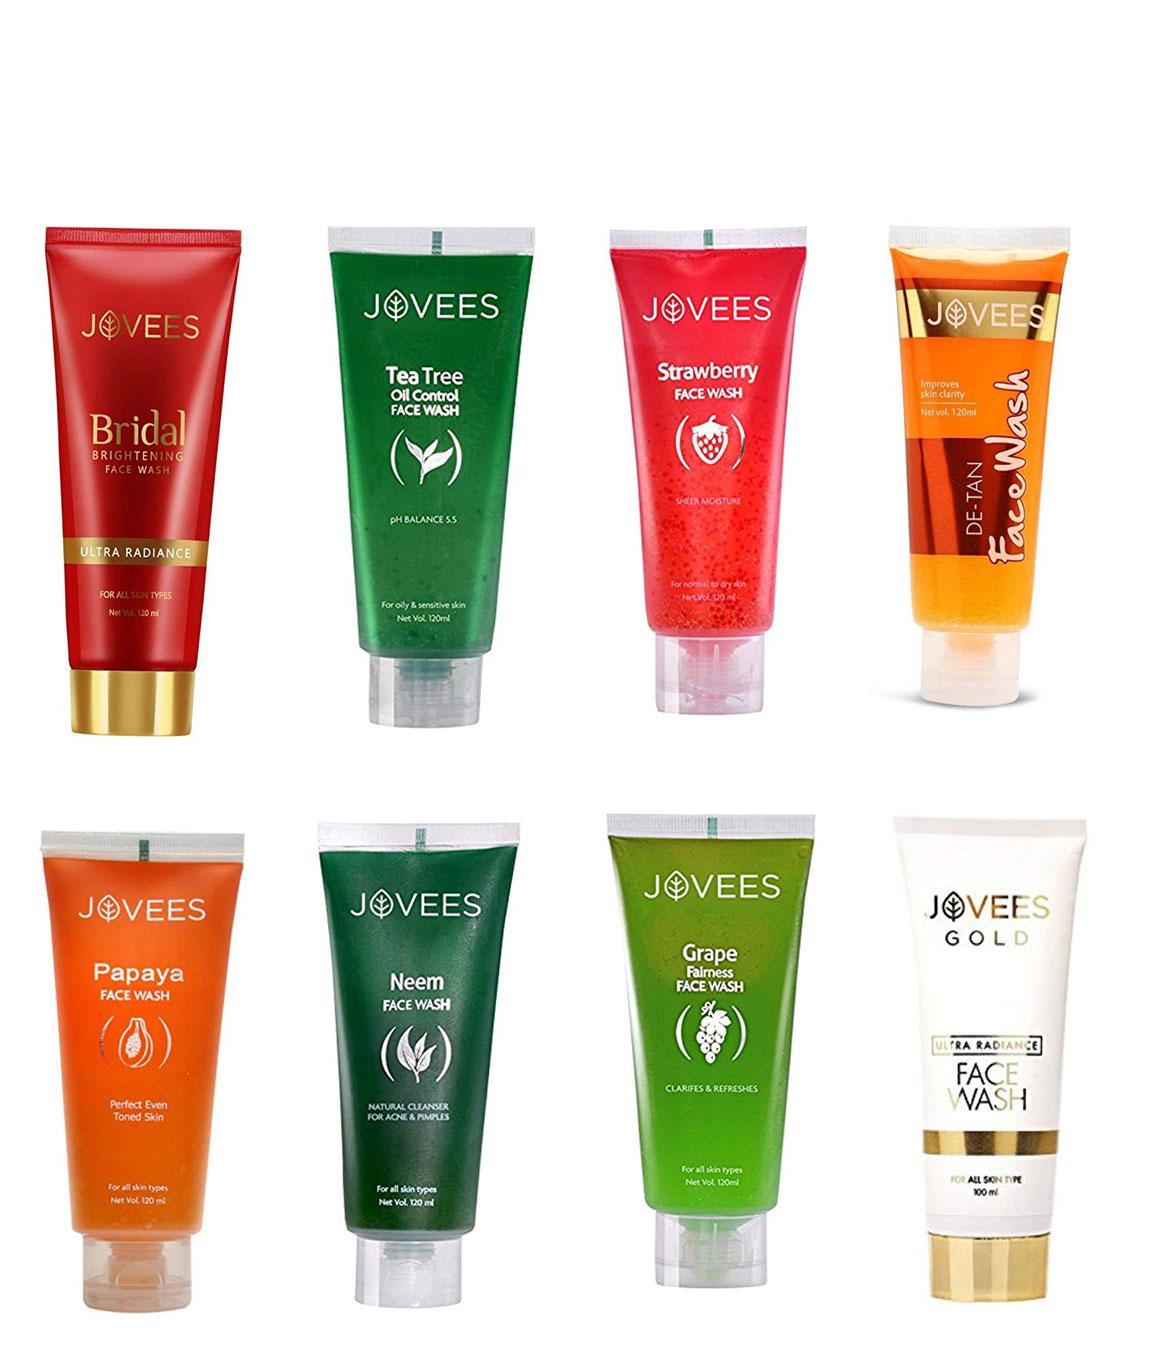 Jovees Face Wash-Eight Flavour-Bridal Brightening,Gold Ultra Radiance,Papaya,De-Tan,Tea Tree,Grape,Neem,Strawberry. Face Wash (120 ml)